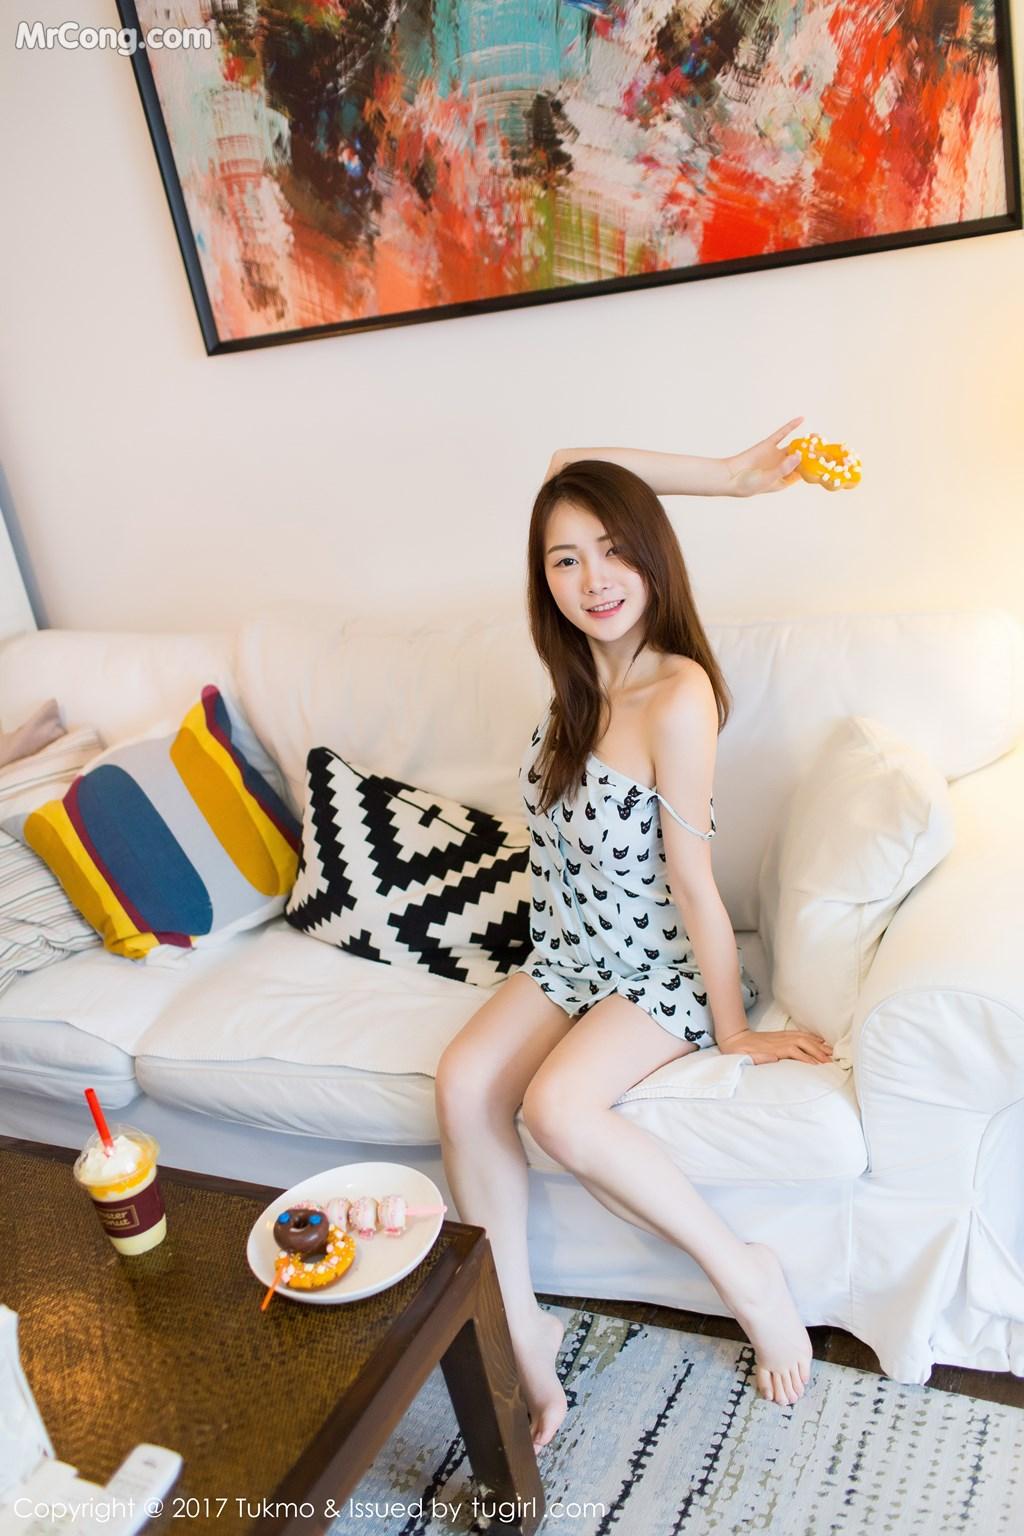 Image Tukmo-Vol.101-Mian-Mian-MrCong.com-001 in post Tukmo Vol.101: Người mẫu Mian Mian (绵绵) (45 ảnh)